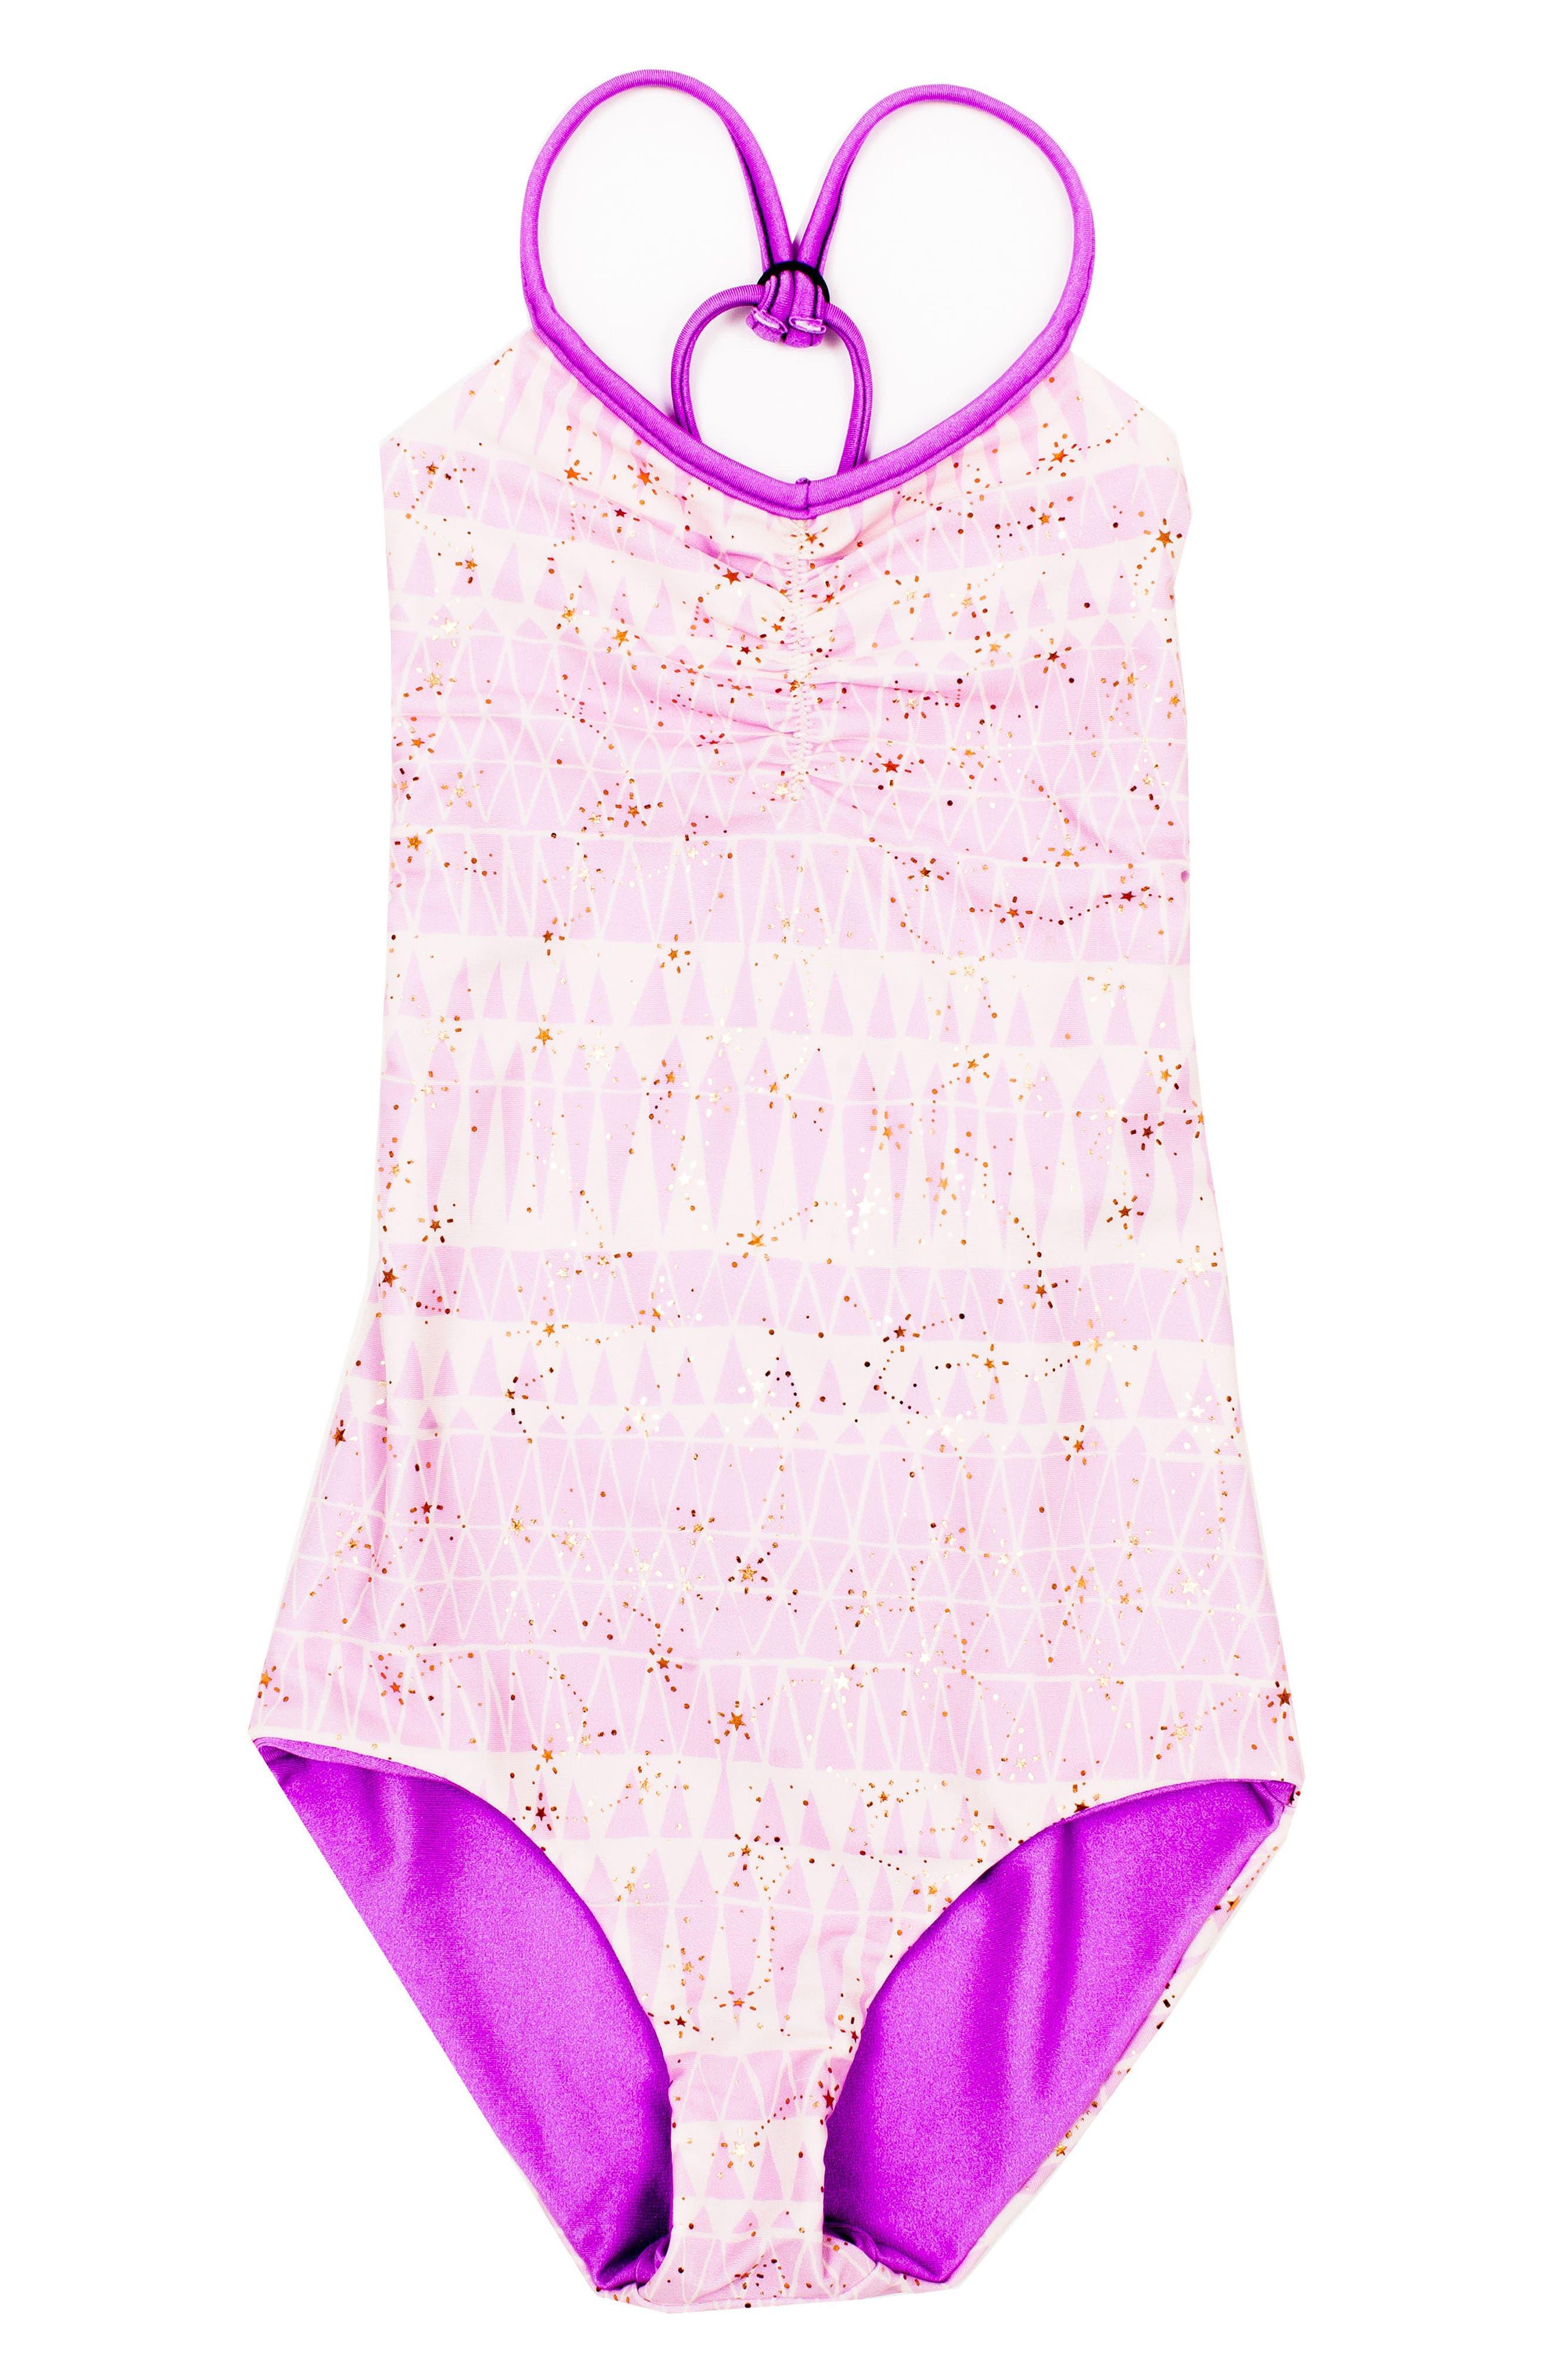 BOWIE X JAMES Catalinakini One-Piece Reversible Swimsuit, Main, color, LAVENDER